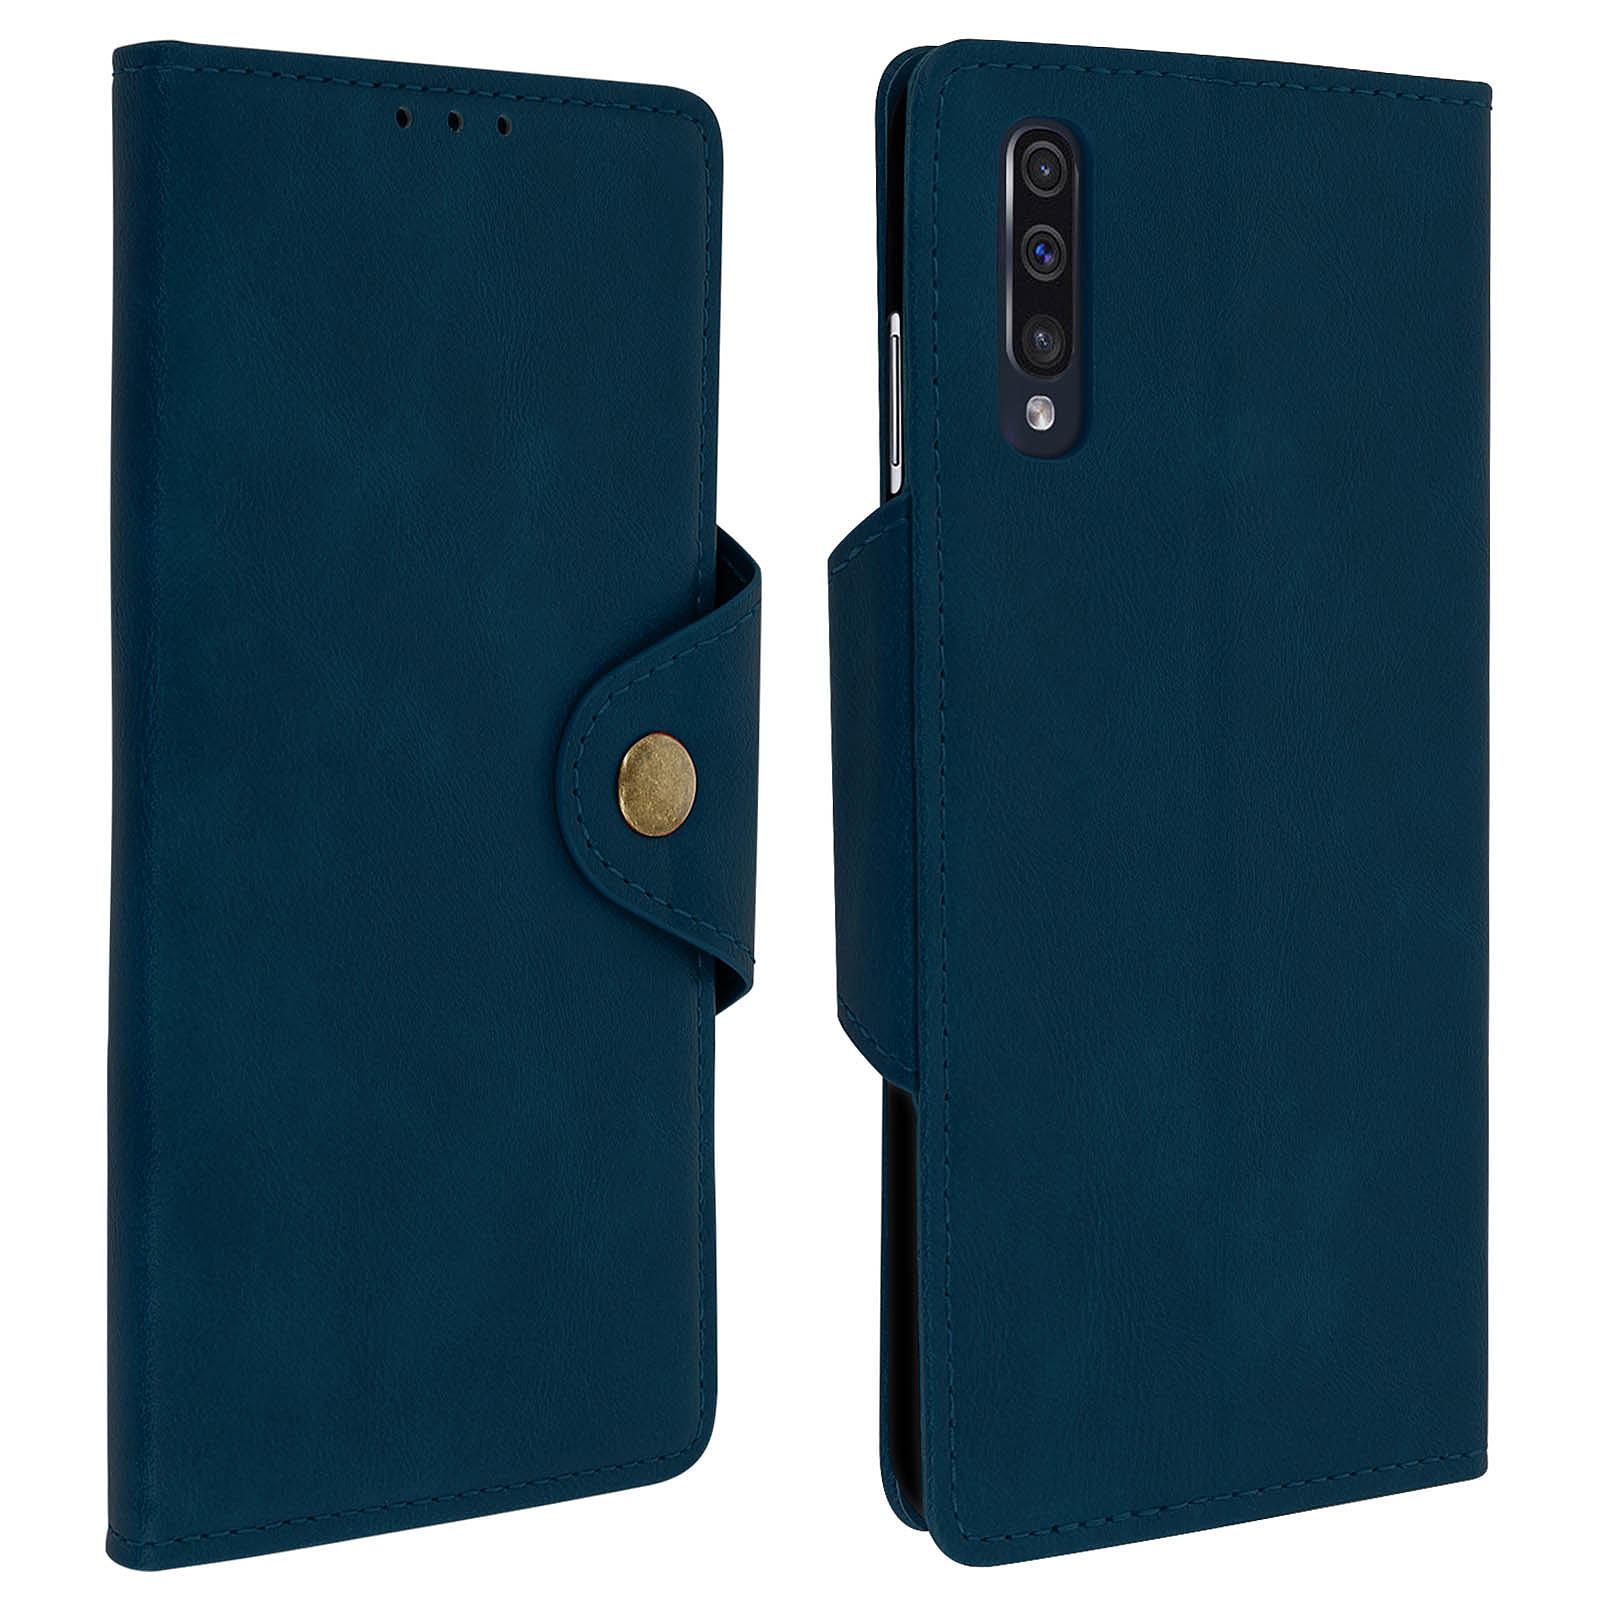 Avizar Etui folio Bleu Nuit pour Samsung Galaxy A50 , Samsung Galaxy A30s